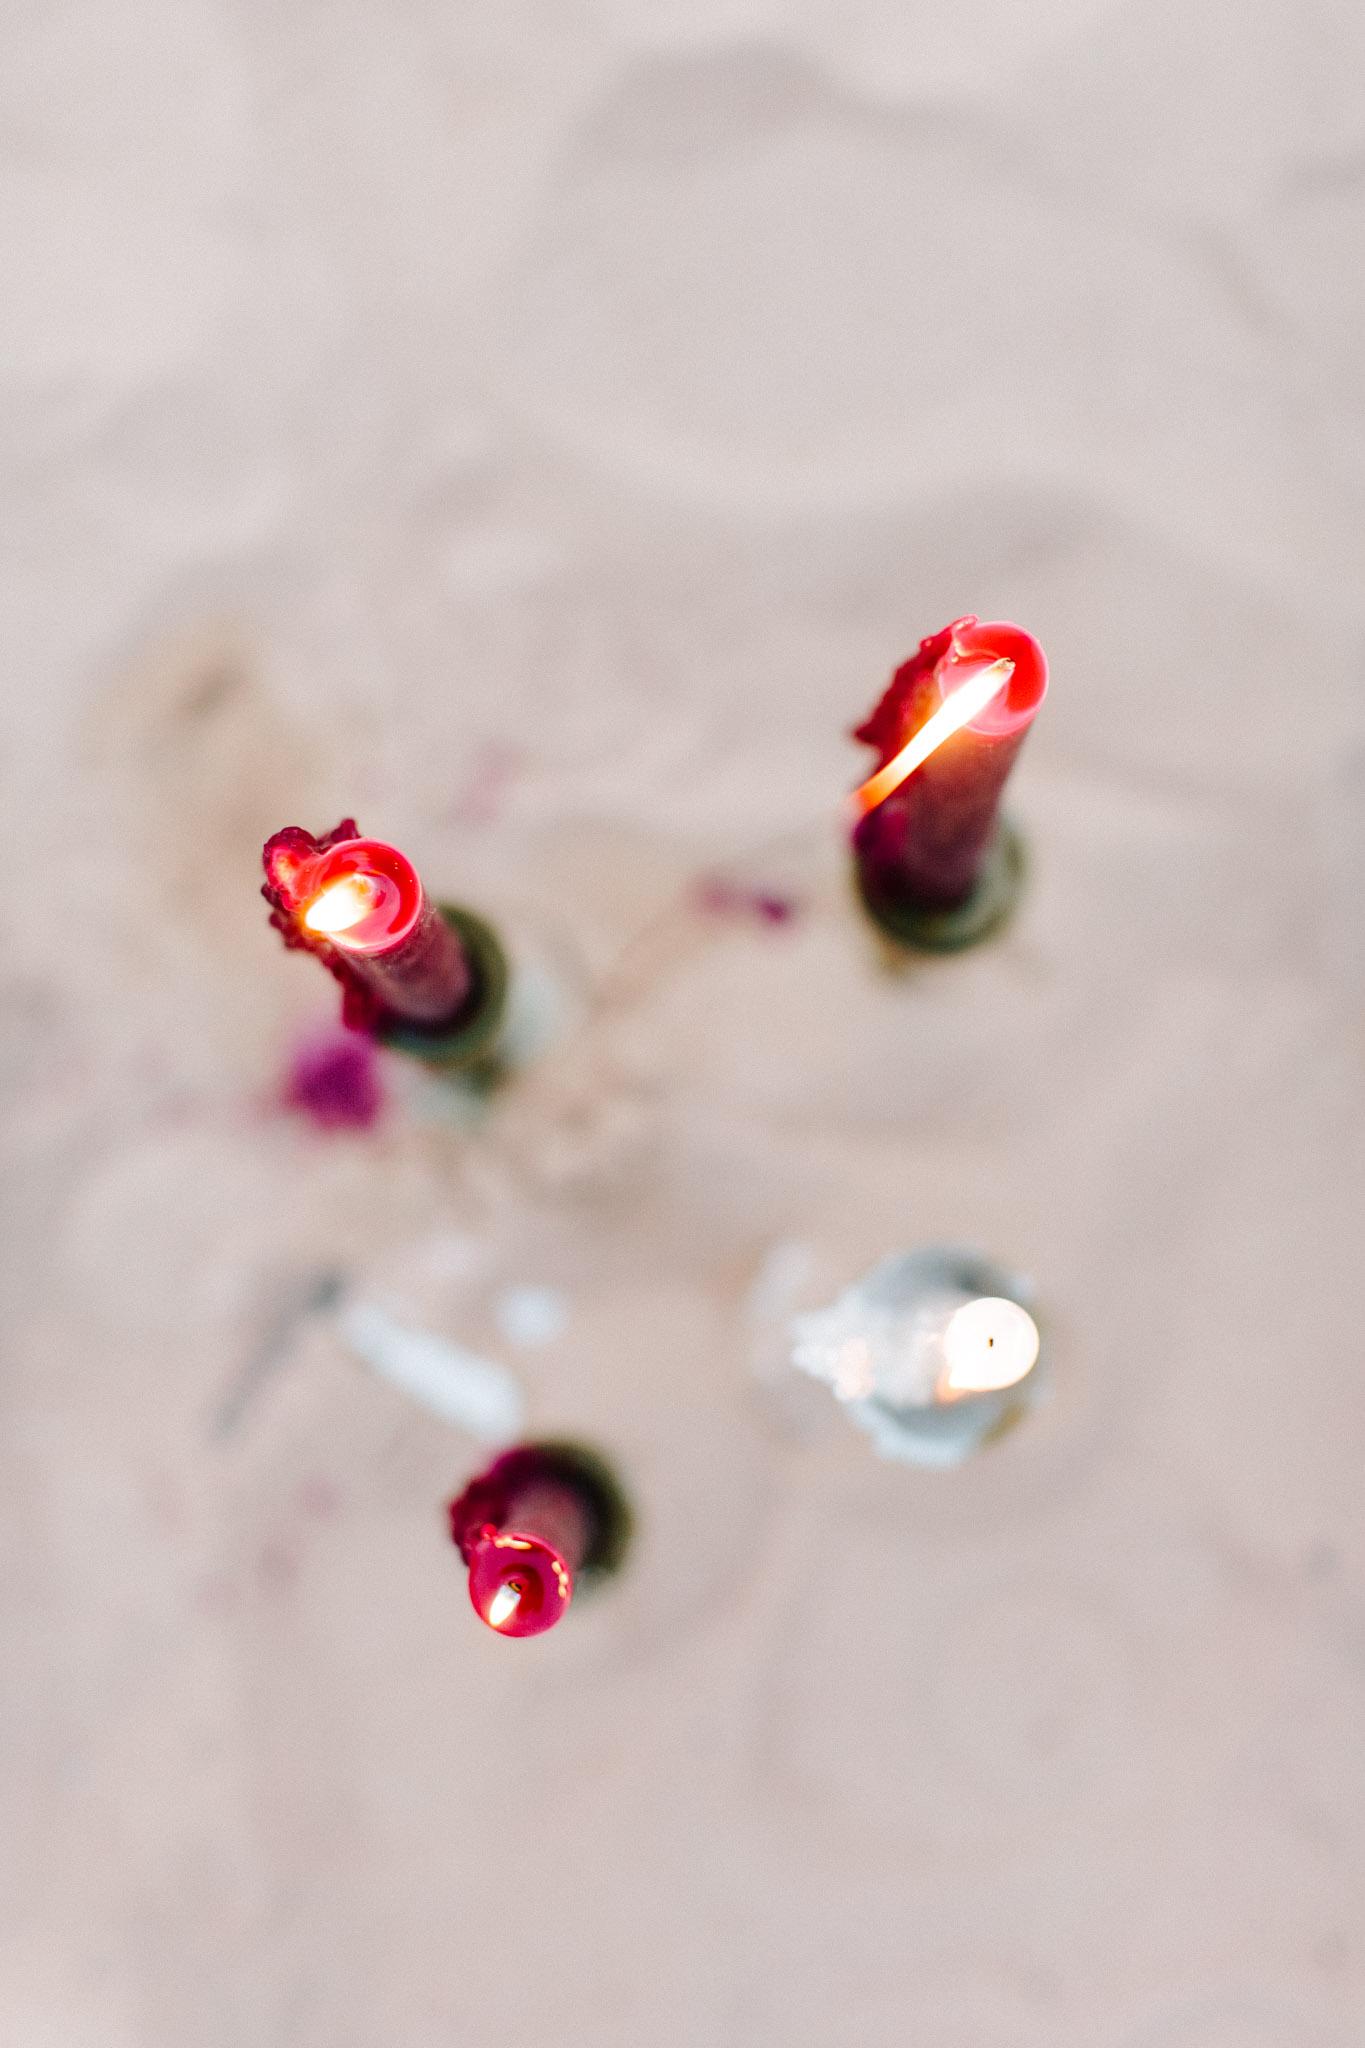 Speyer-Moroccan-Wedding-Inspiration-Pia-Anna-Christian-Wedding-Photography-S-56.jpg